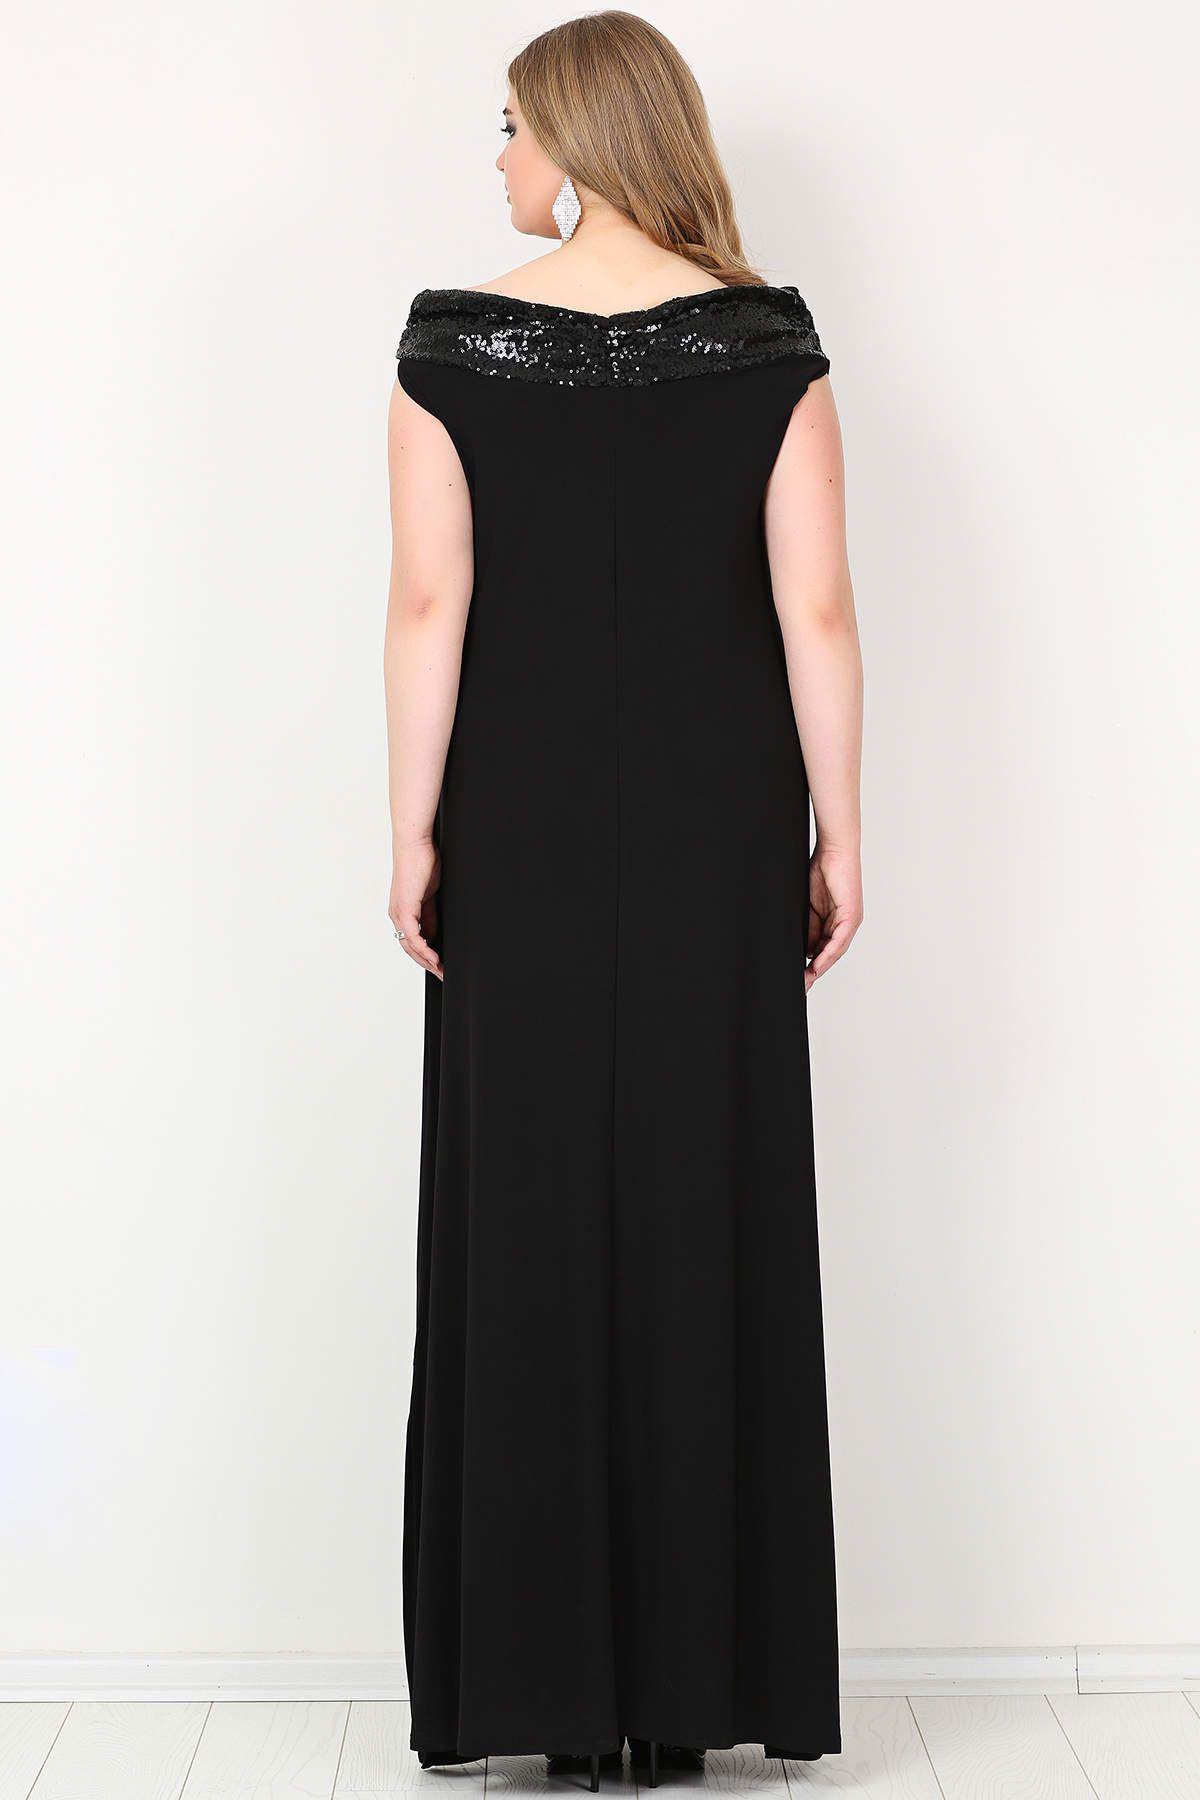 Dresses-Black